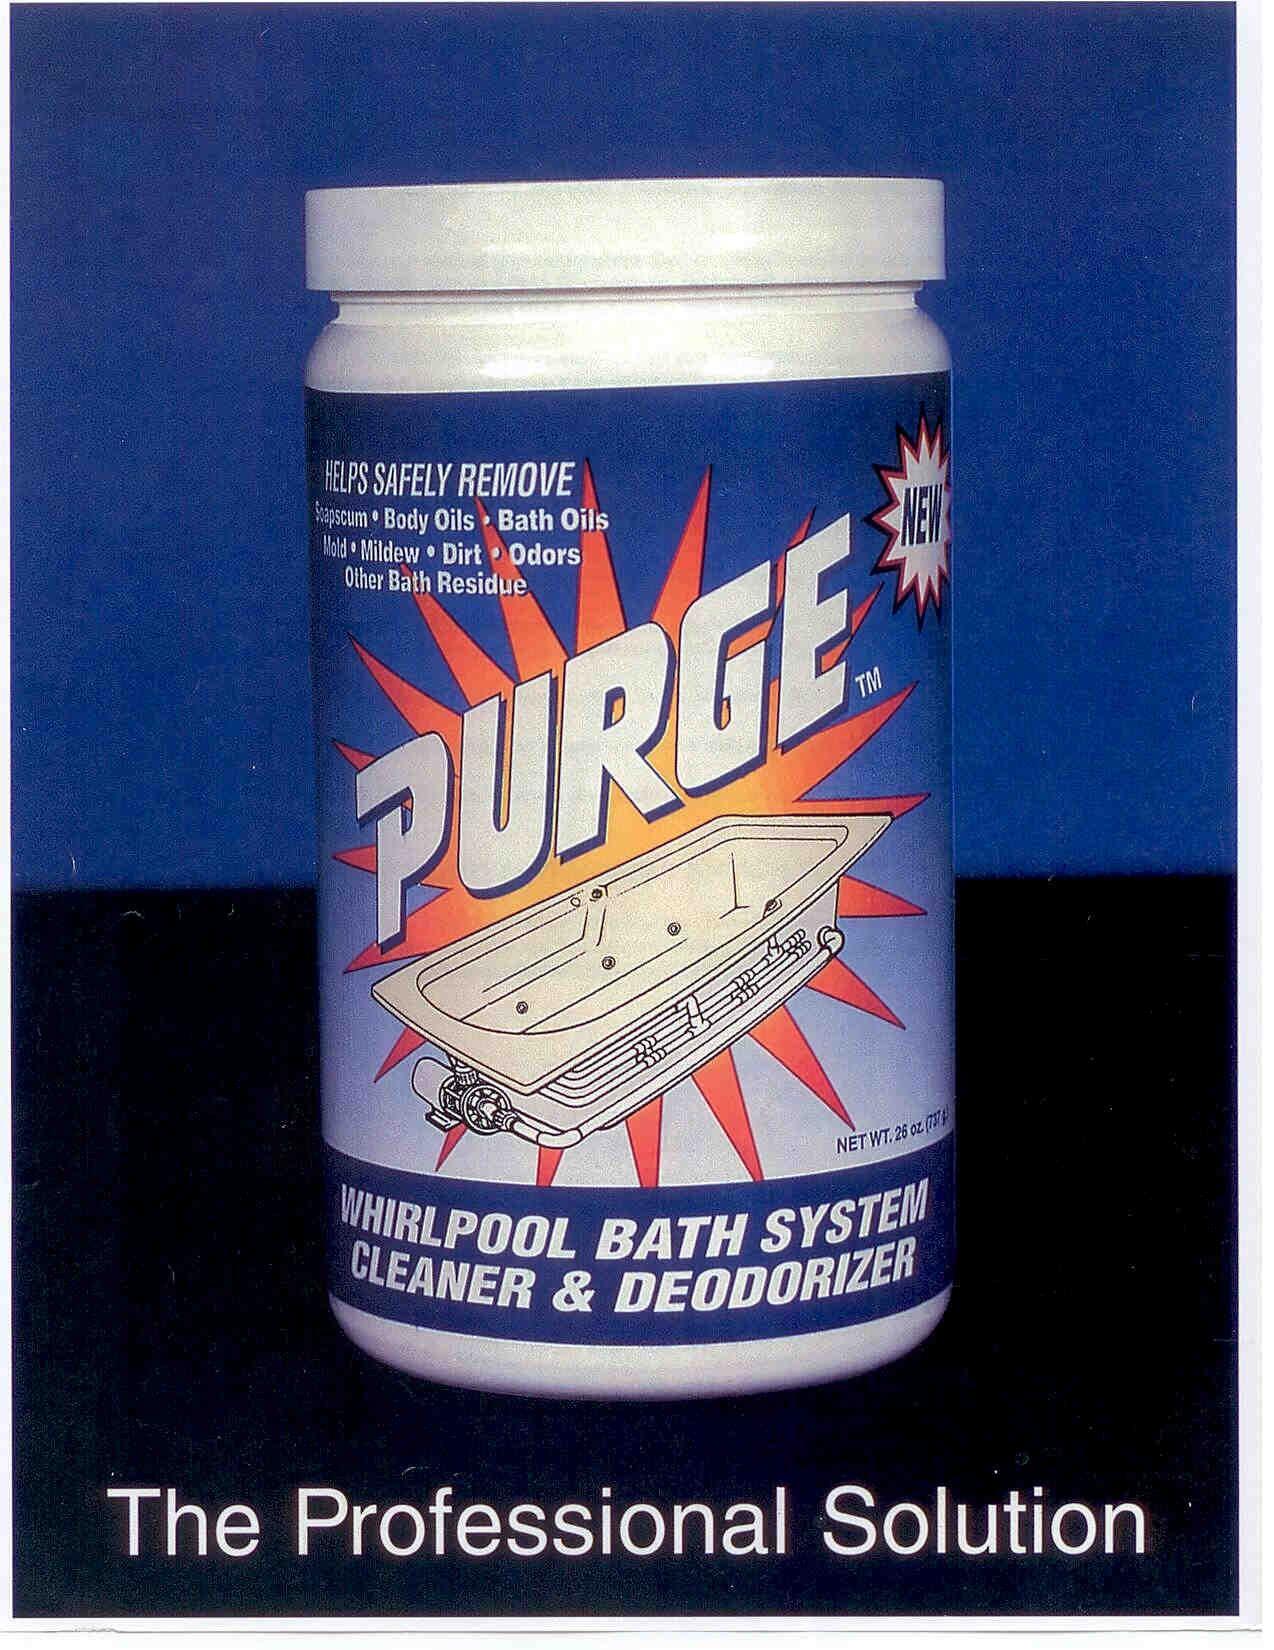 PURGE Whirlpool Bath System Cleaner & Deodorizer\